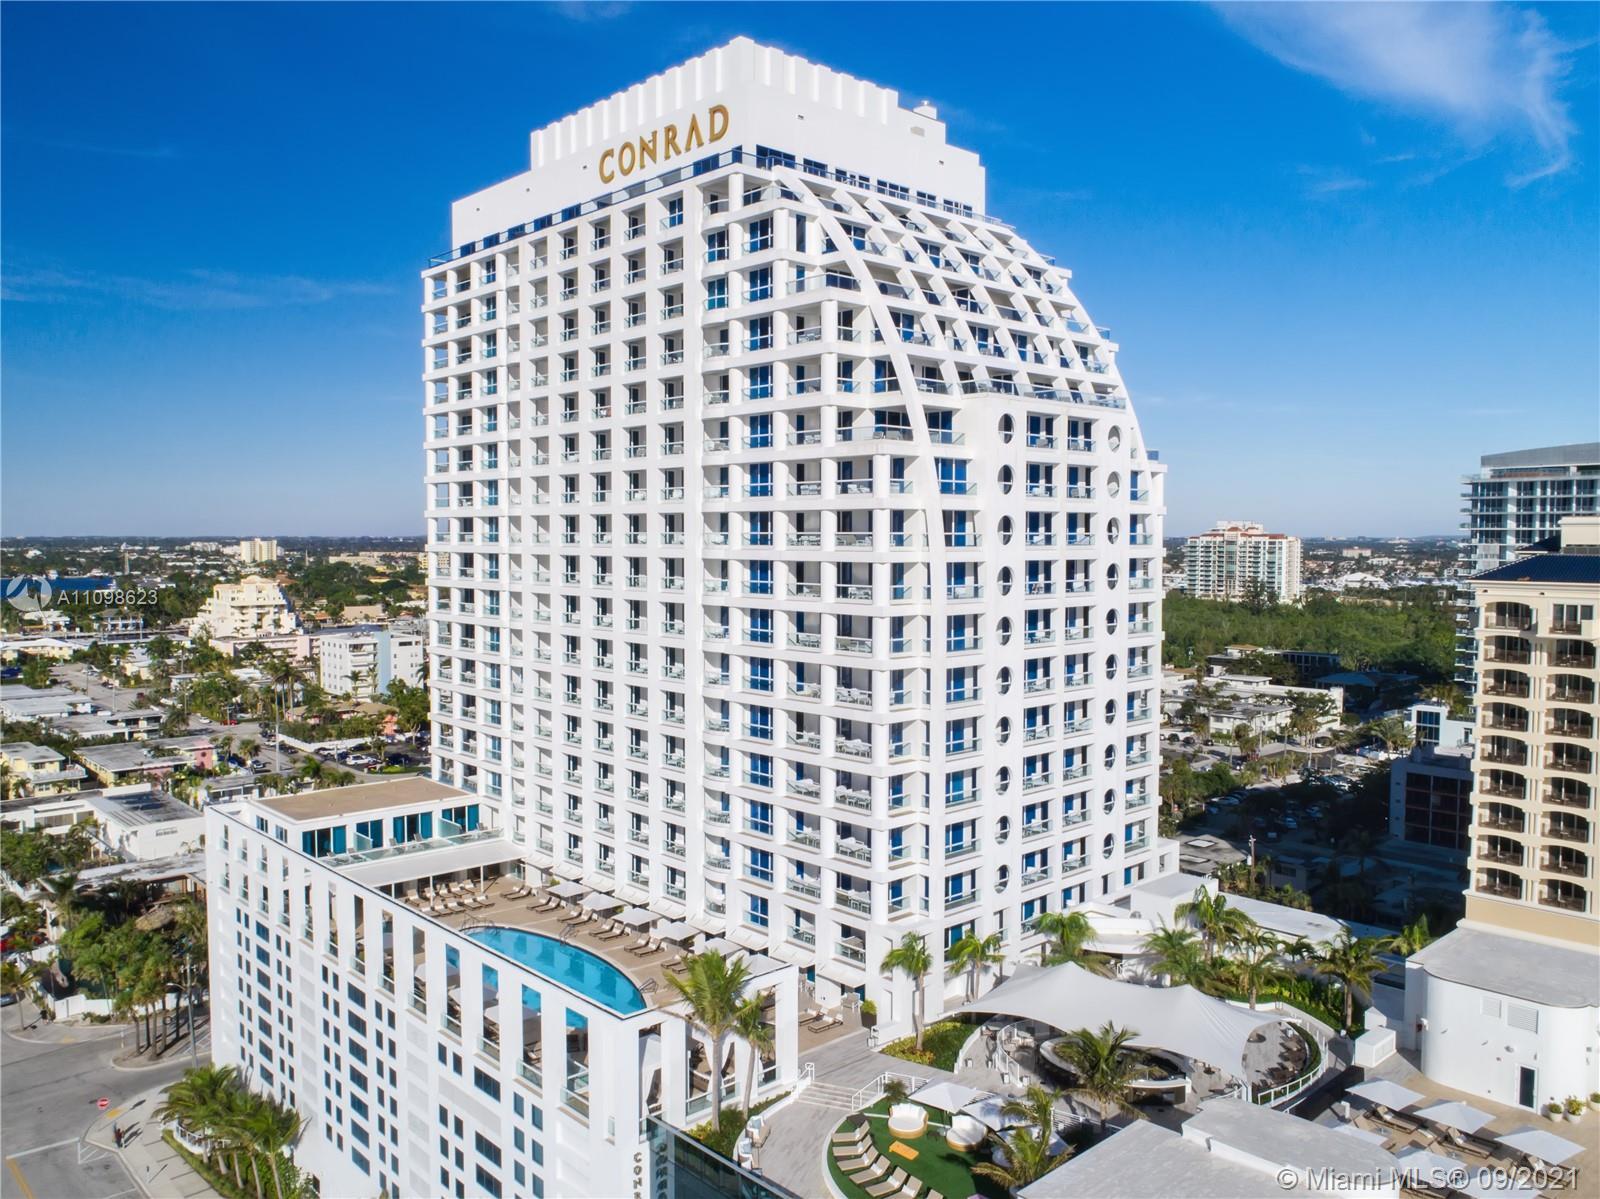 551 N Fort Lauderdale Beach Blvd #16